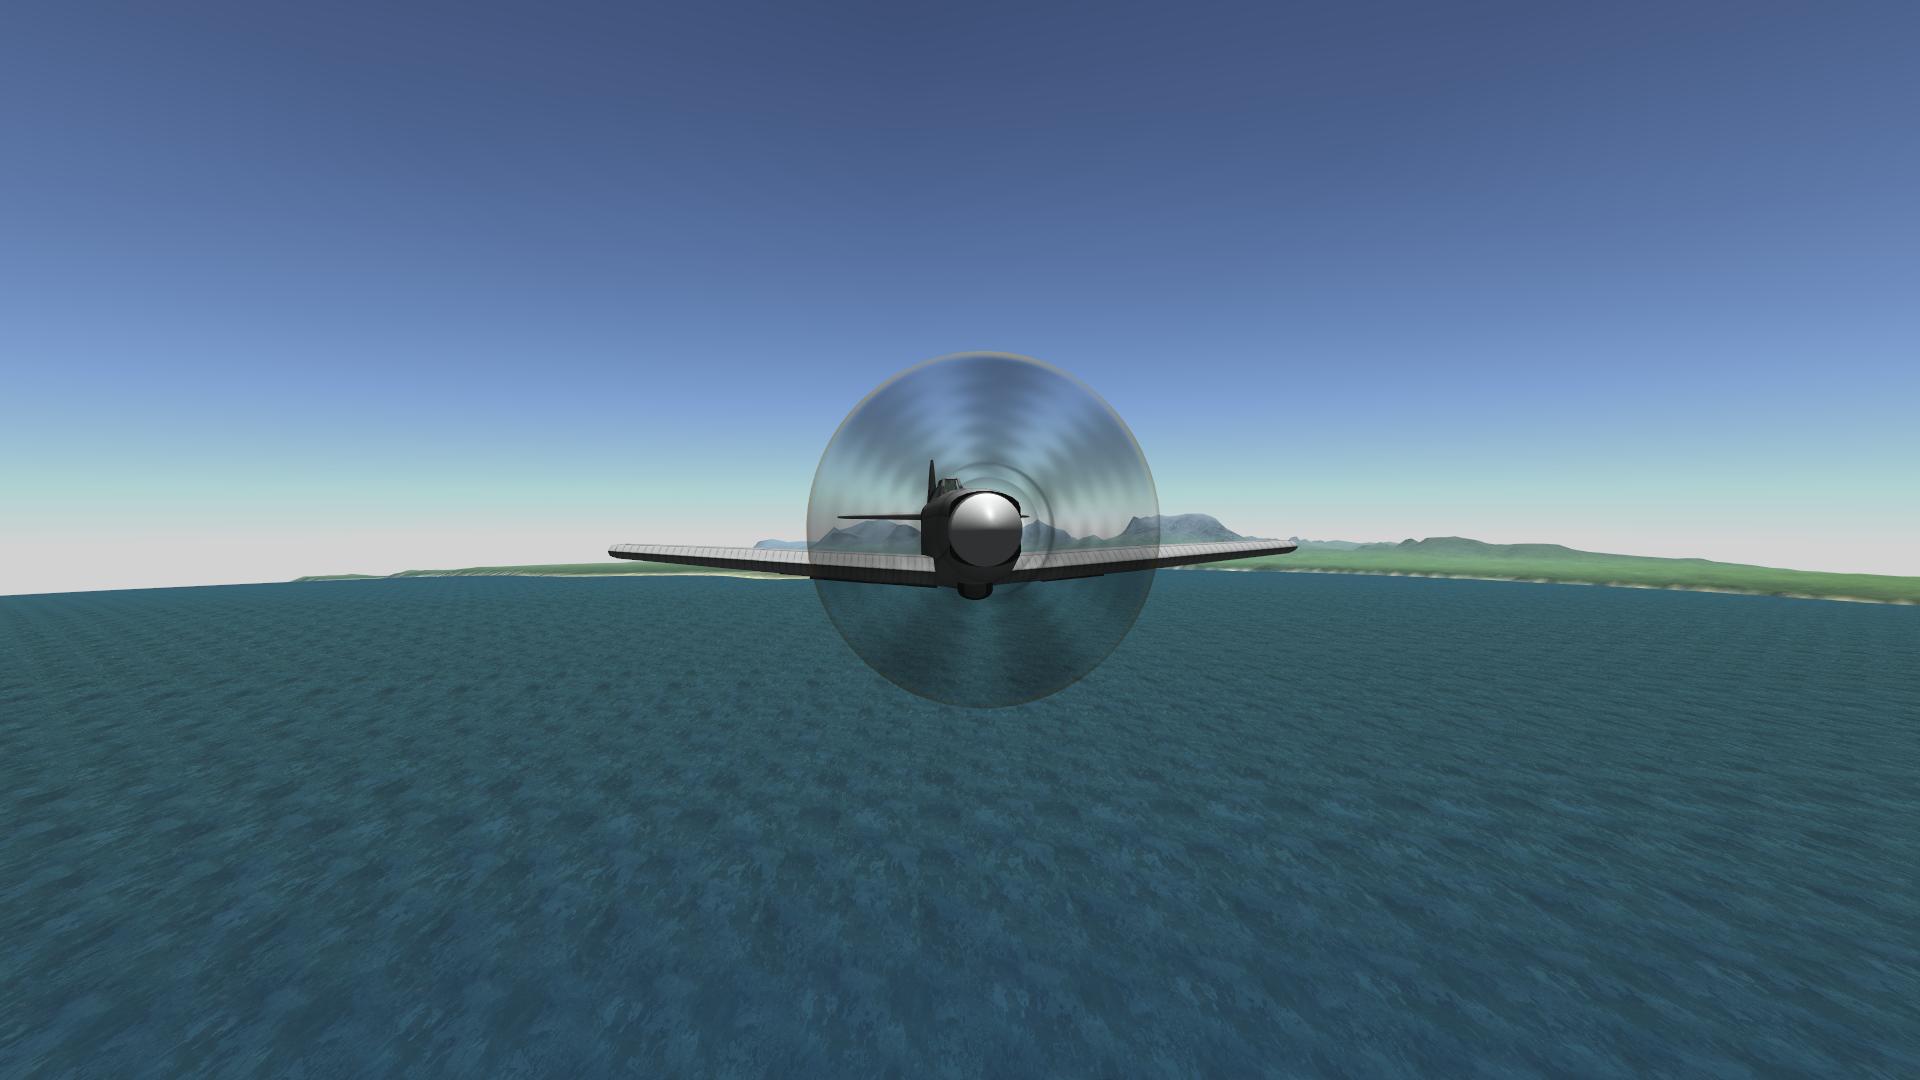 Screenshot11 by LythroA